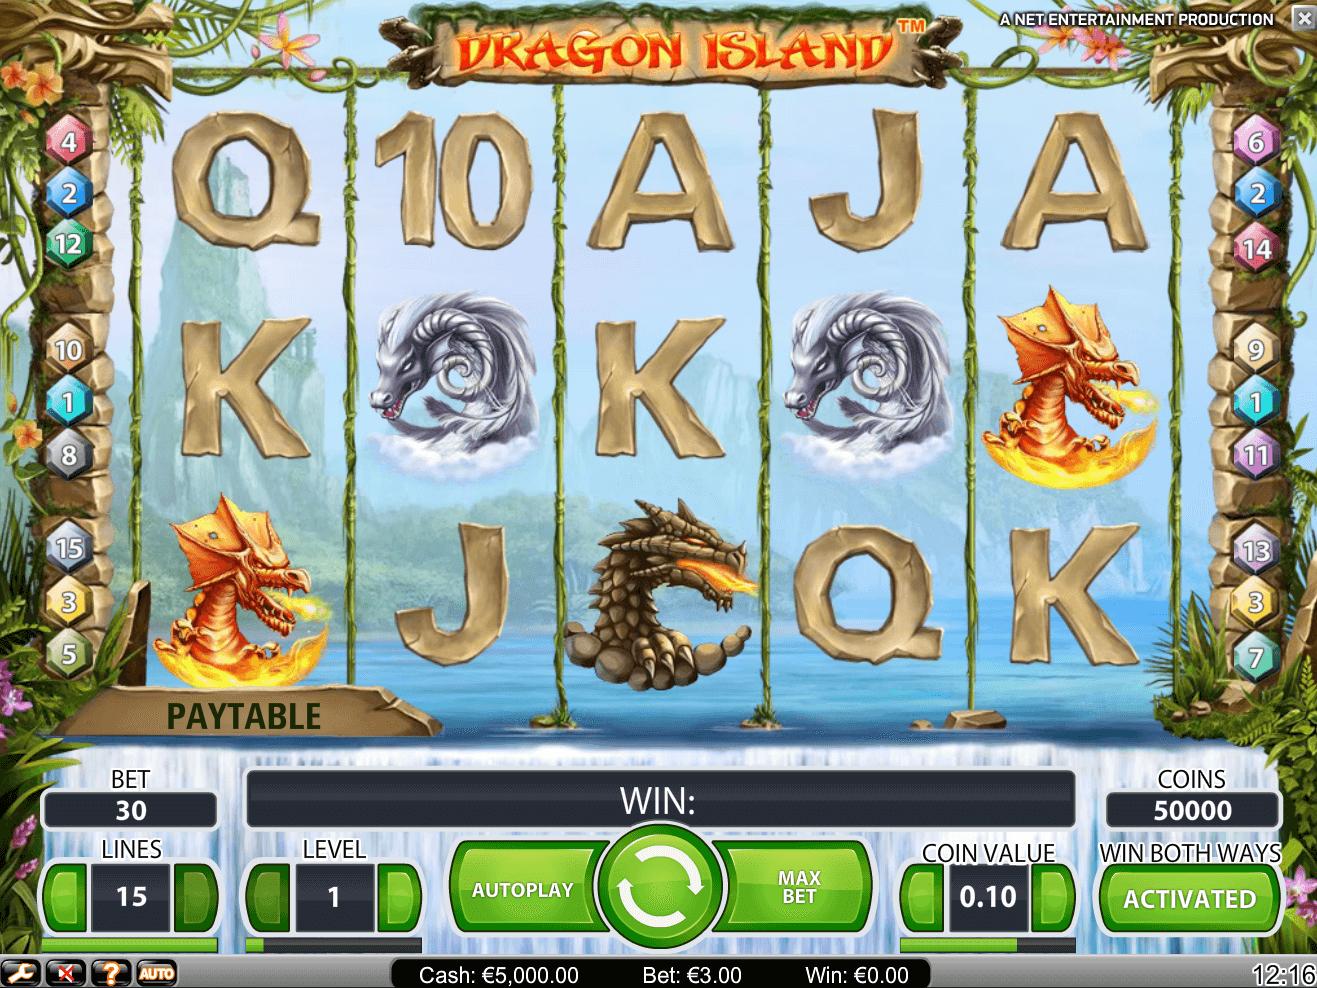 Gratis bonos de Net Entertainment casino mas grande del mundo-569139